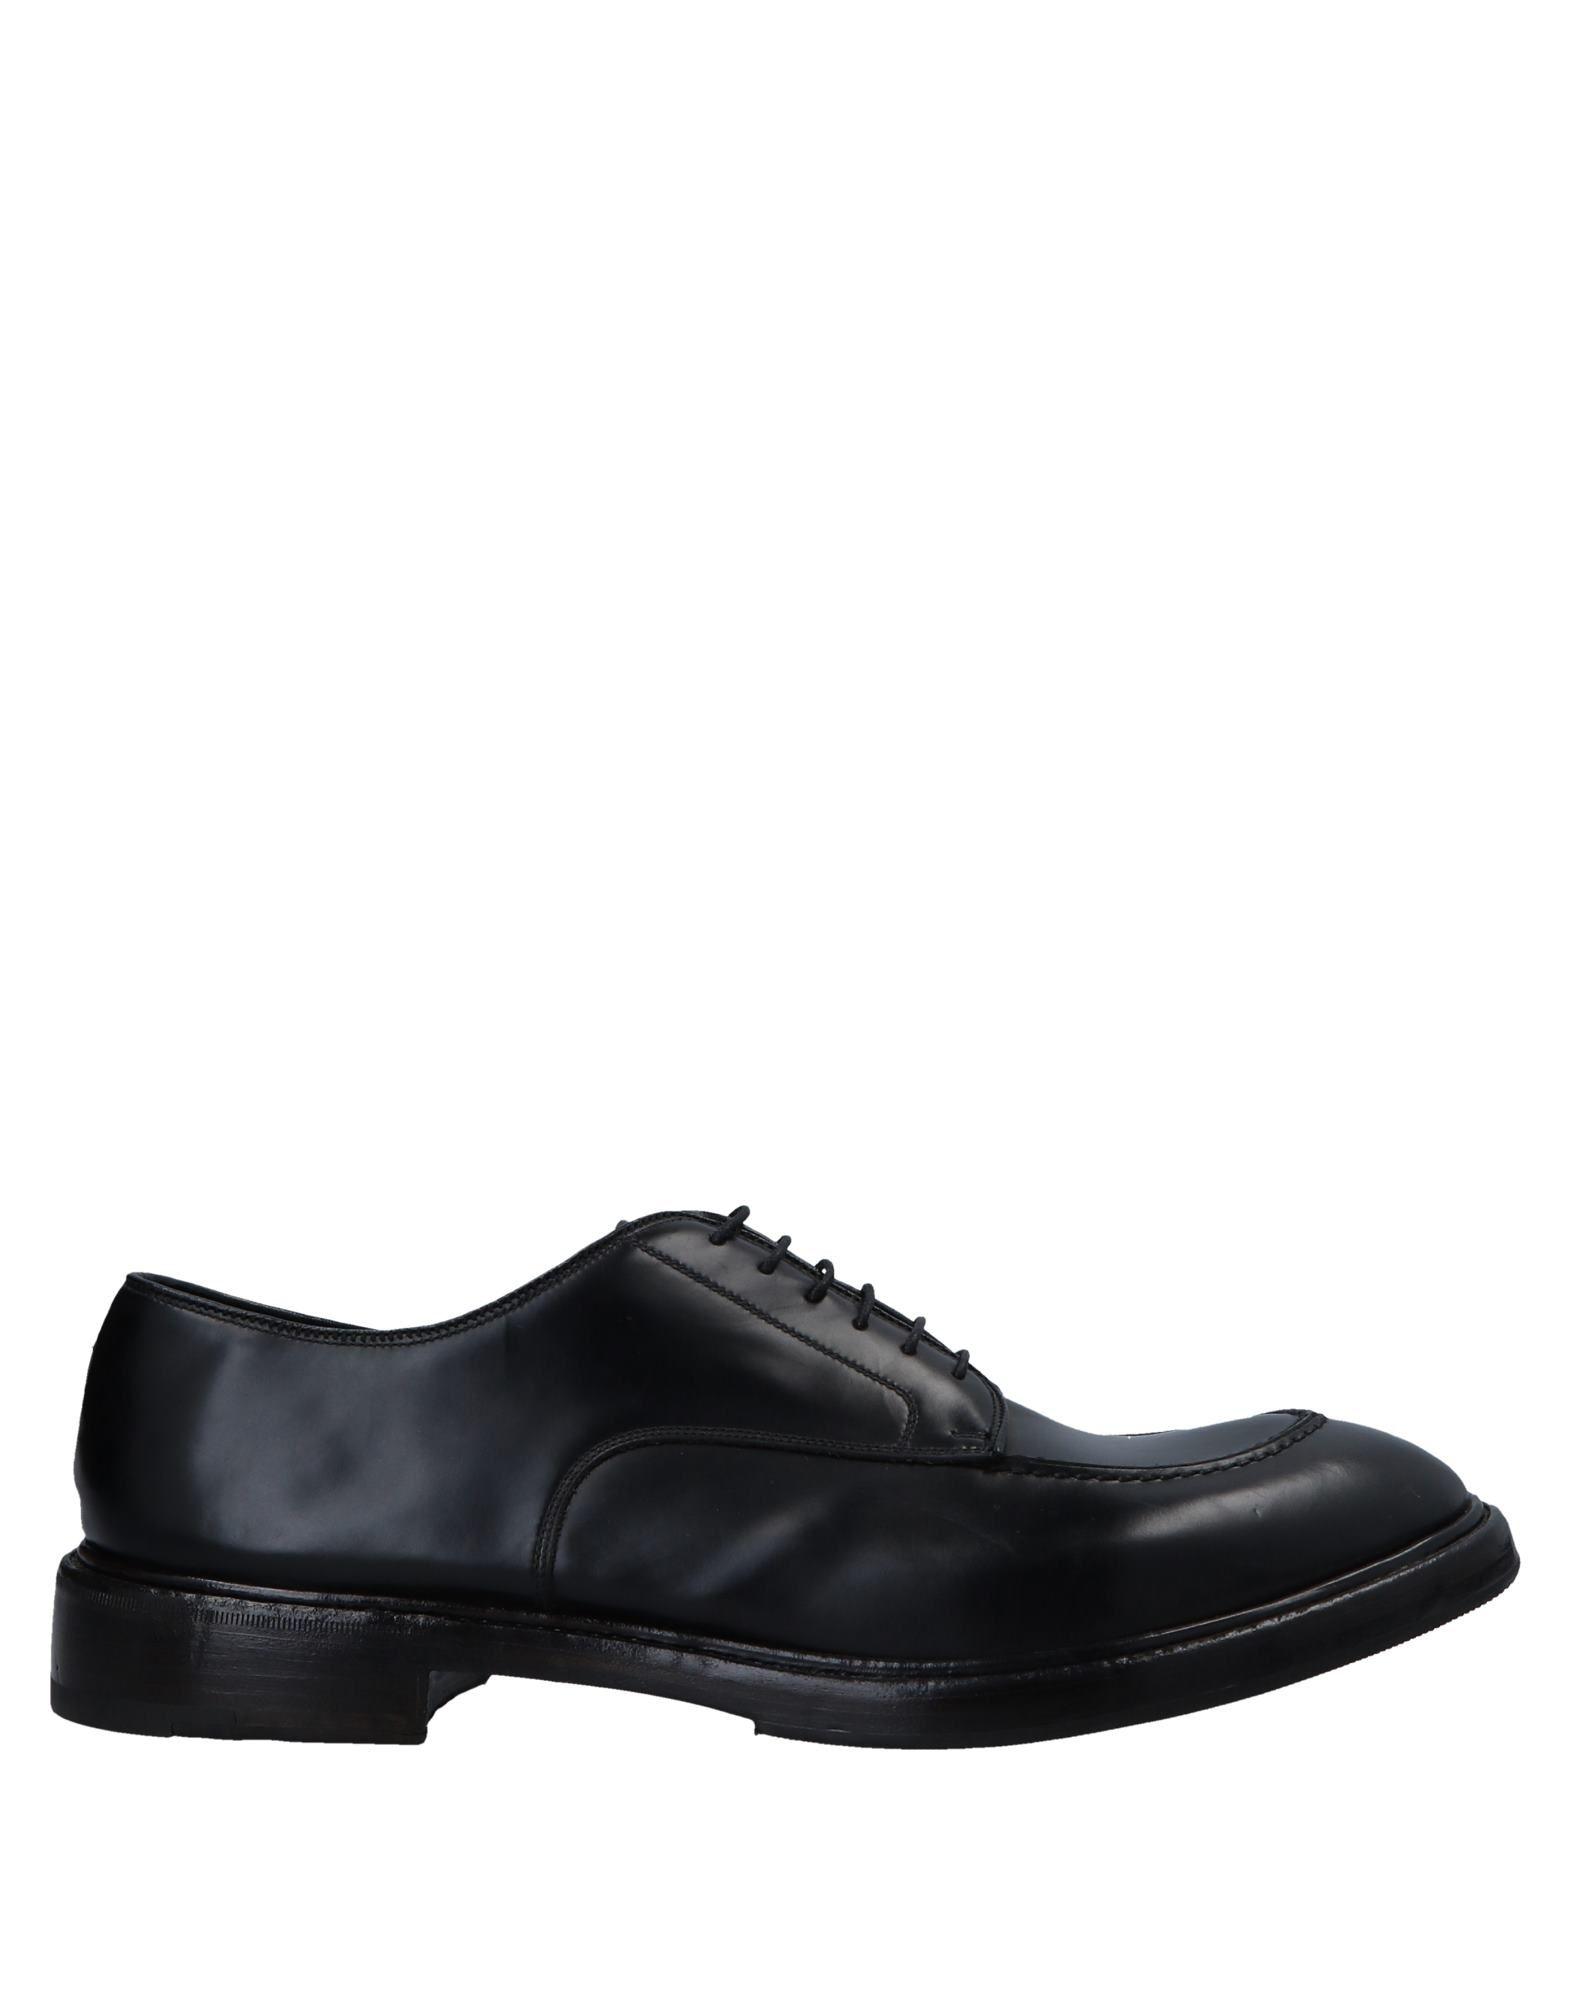 Premiata Schnürschuhe Herren  11554189KA Gute Qualität beliebte Schuhe